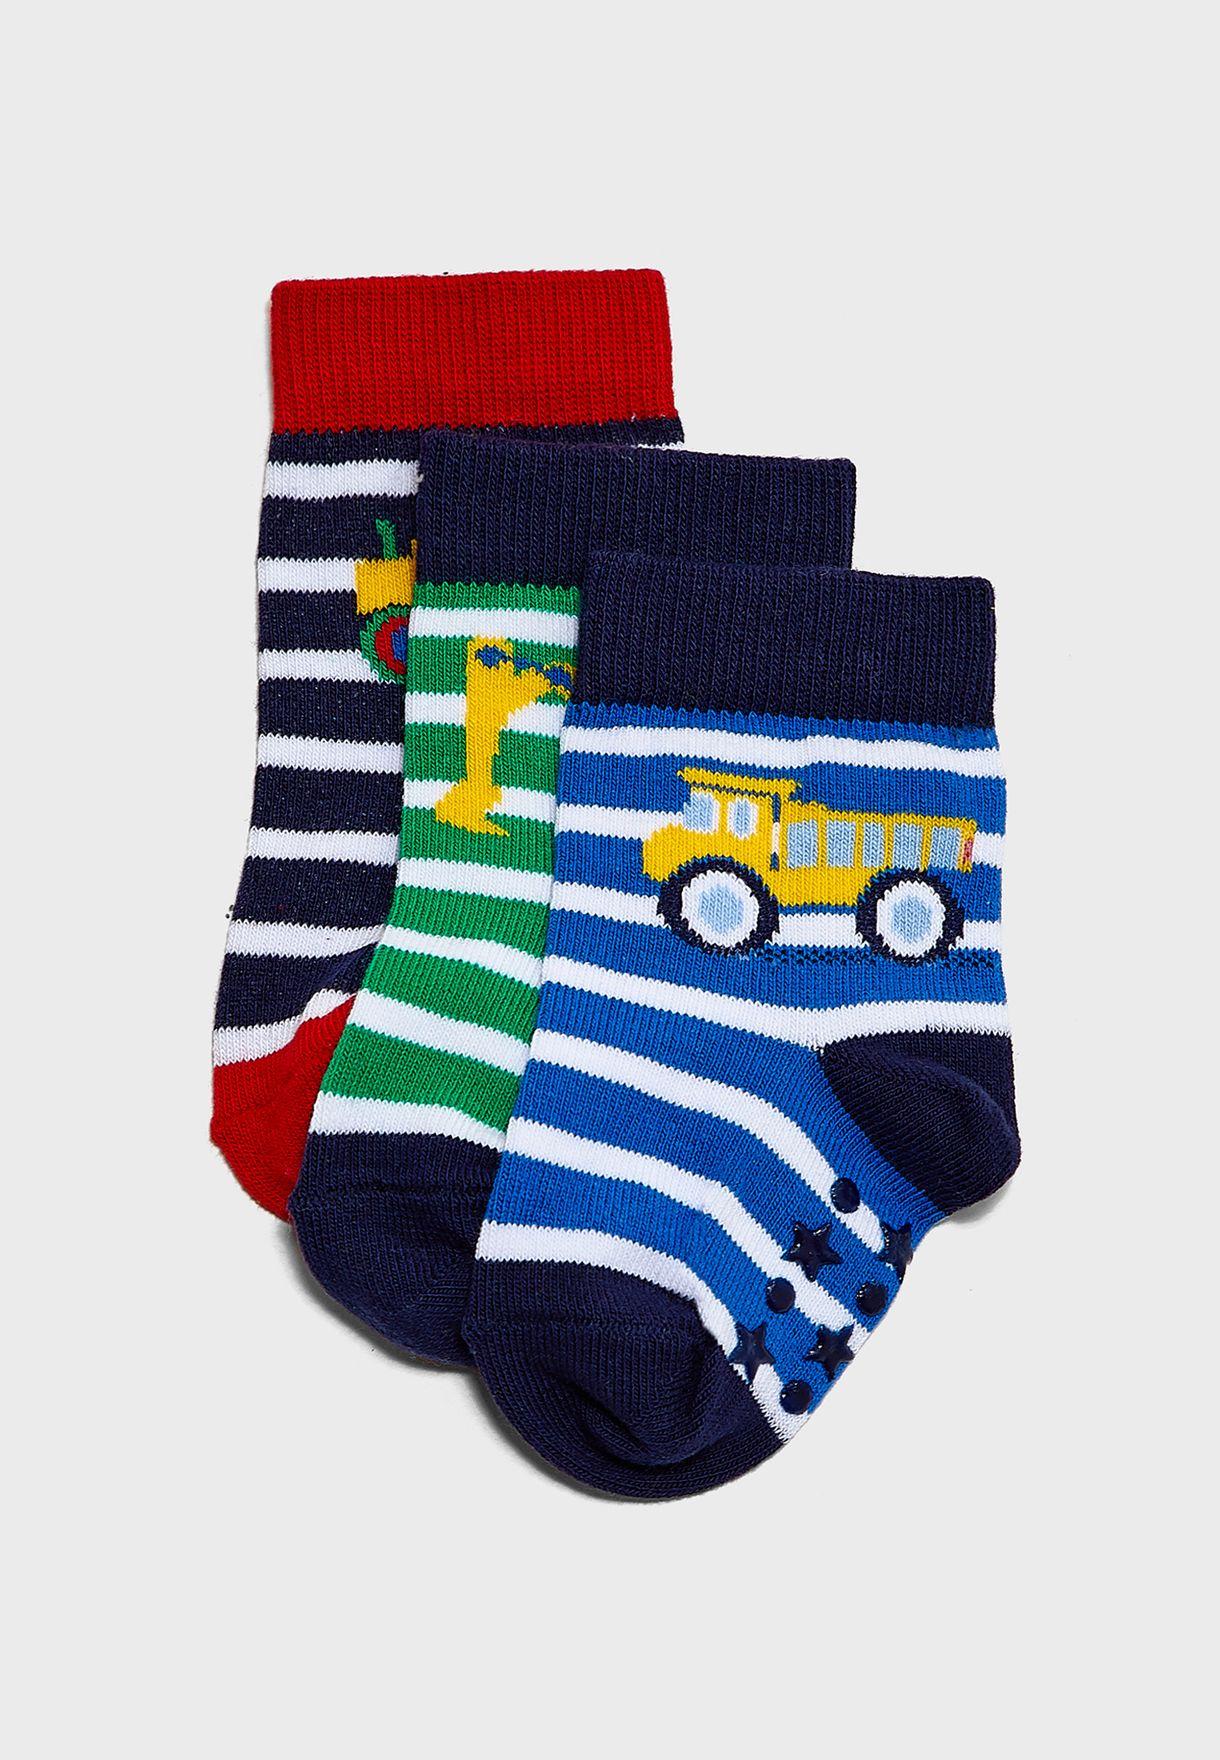 Kids 3 Pack Digger & Tractor Socks